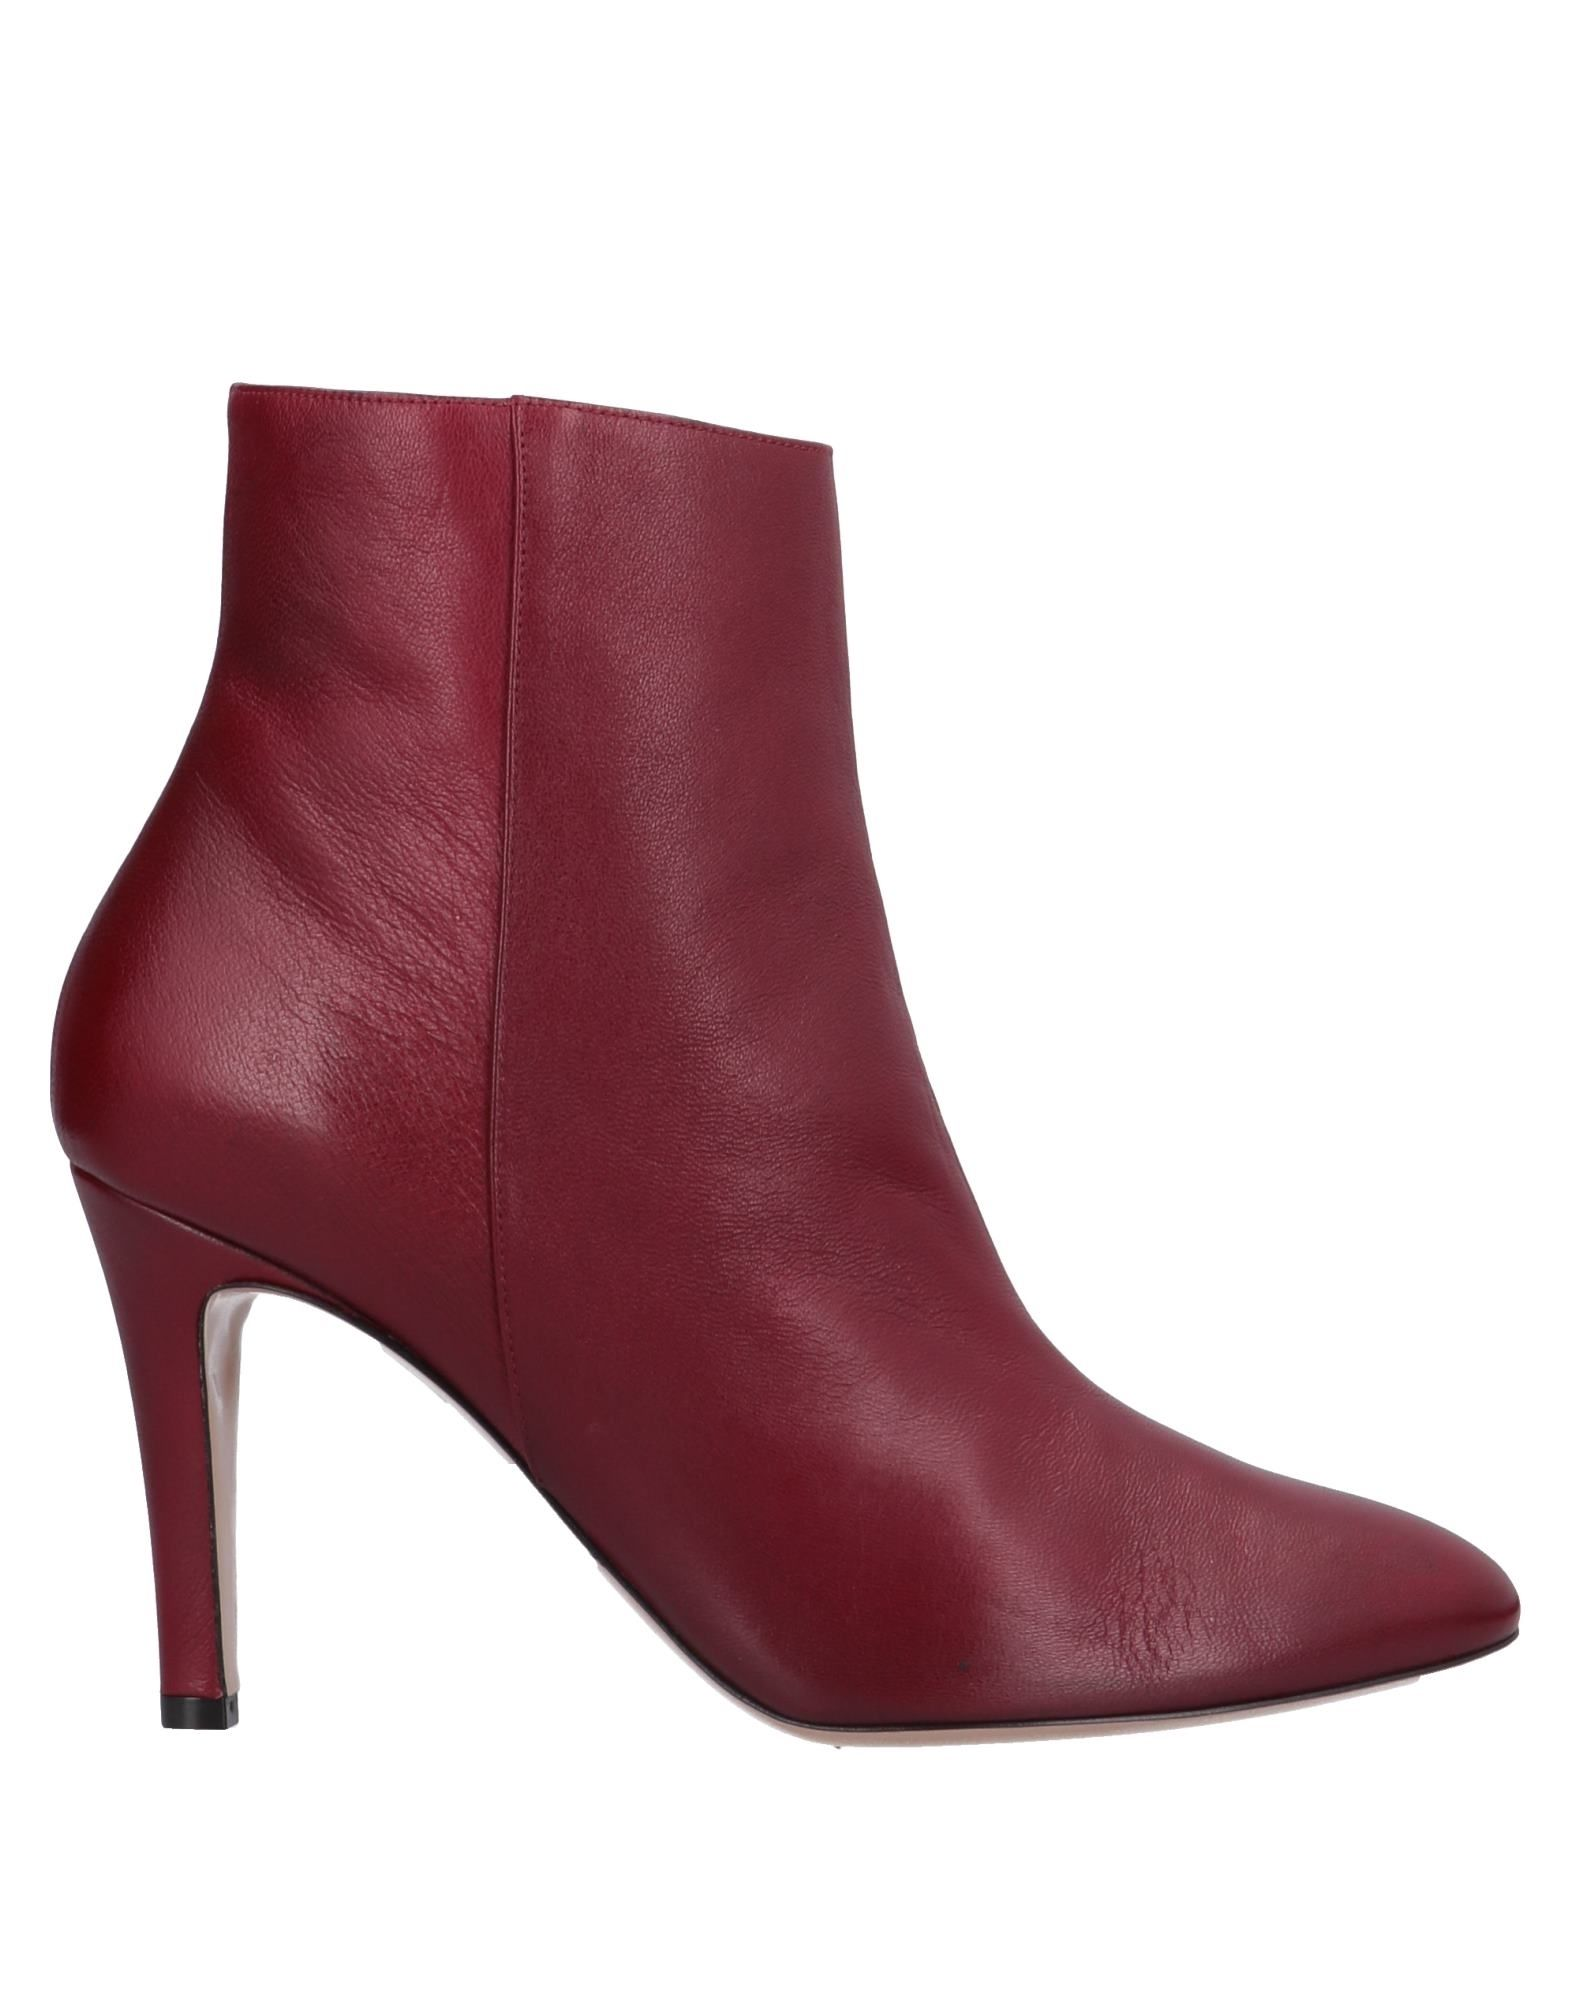 Stilvolle billige Stiefelette Schuhe Fabio Rusconi Stiefelette billige Damen  11532186BX 3af7a6